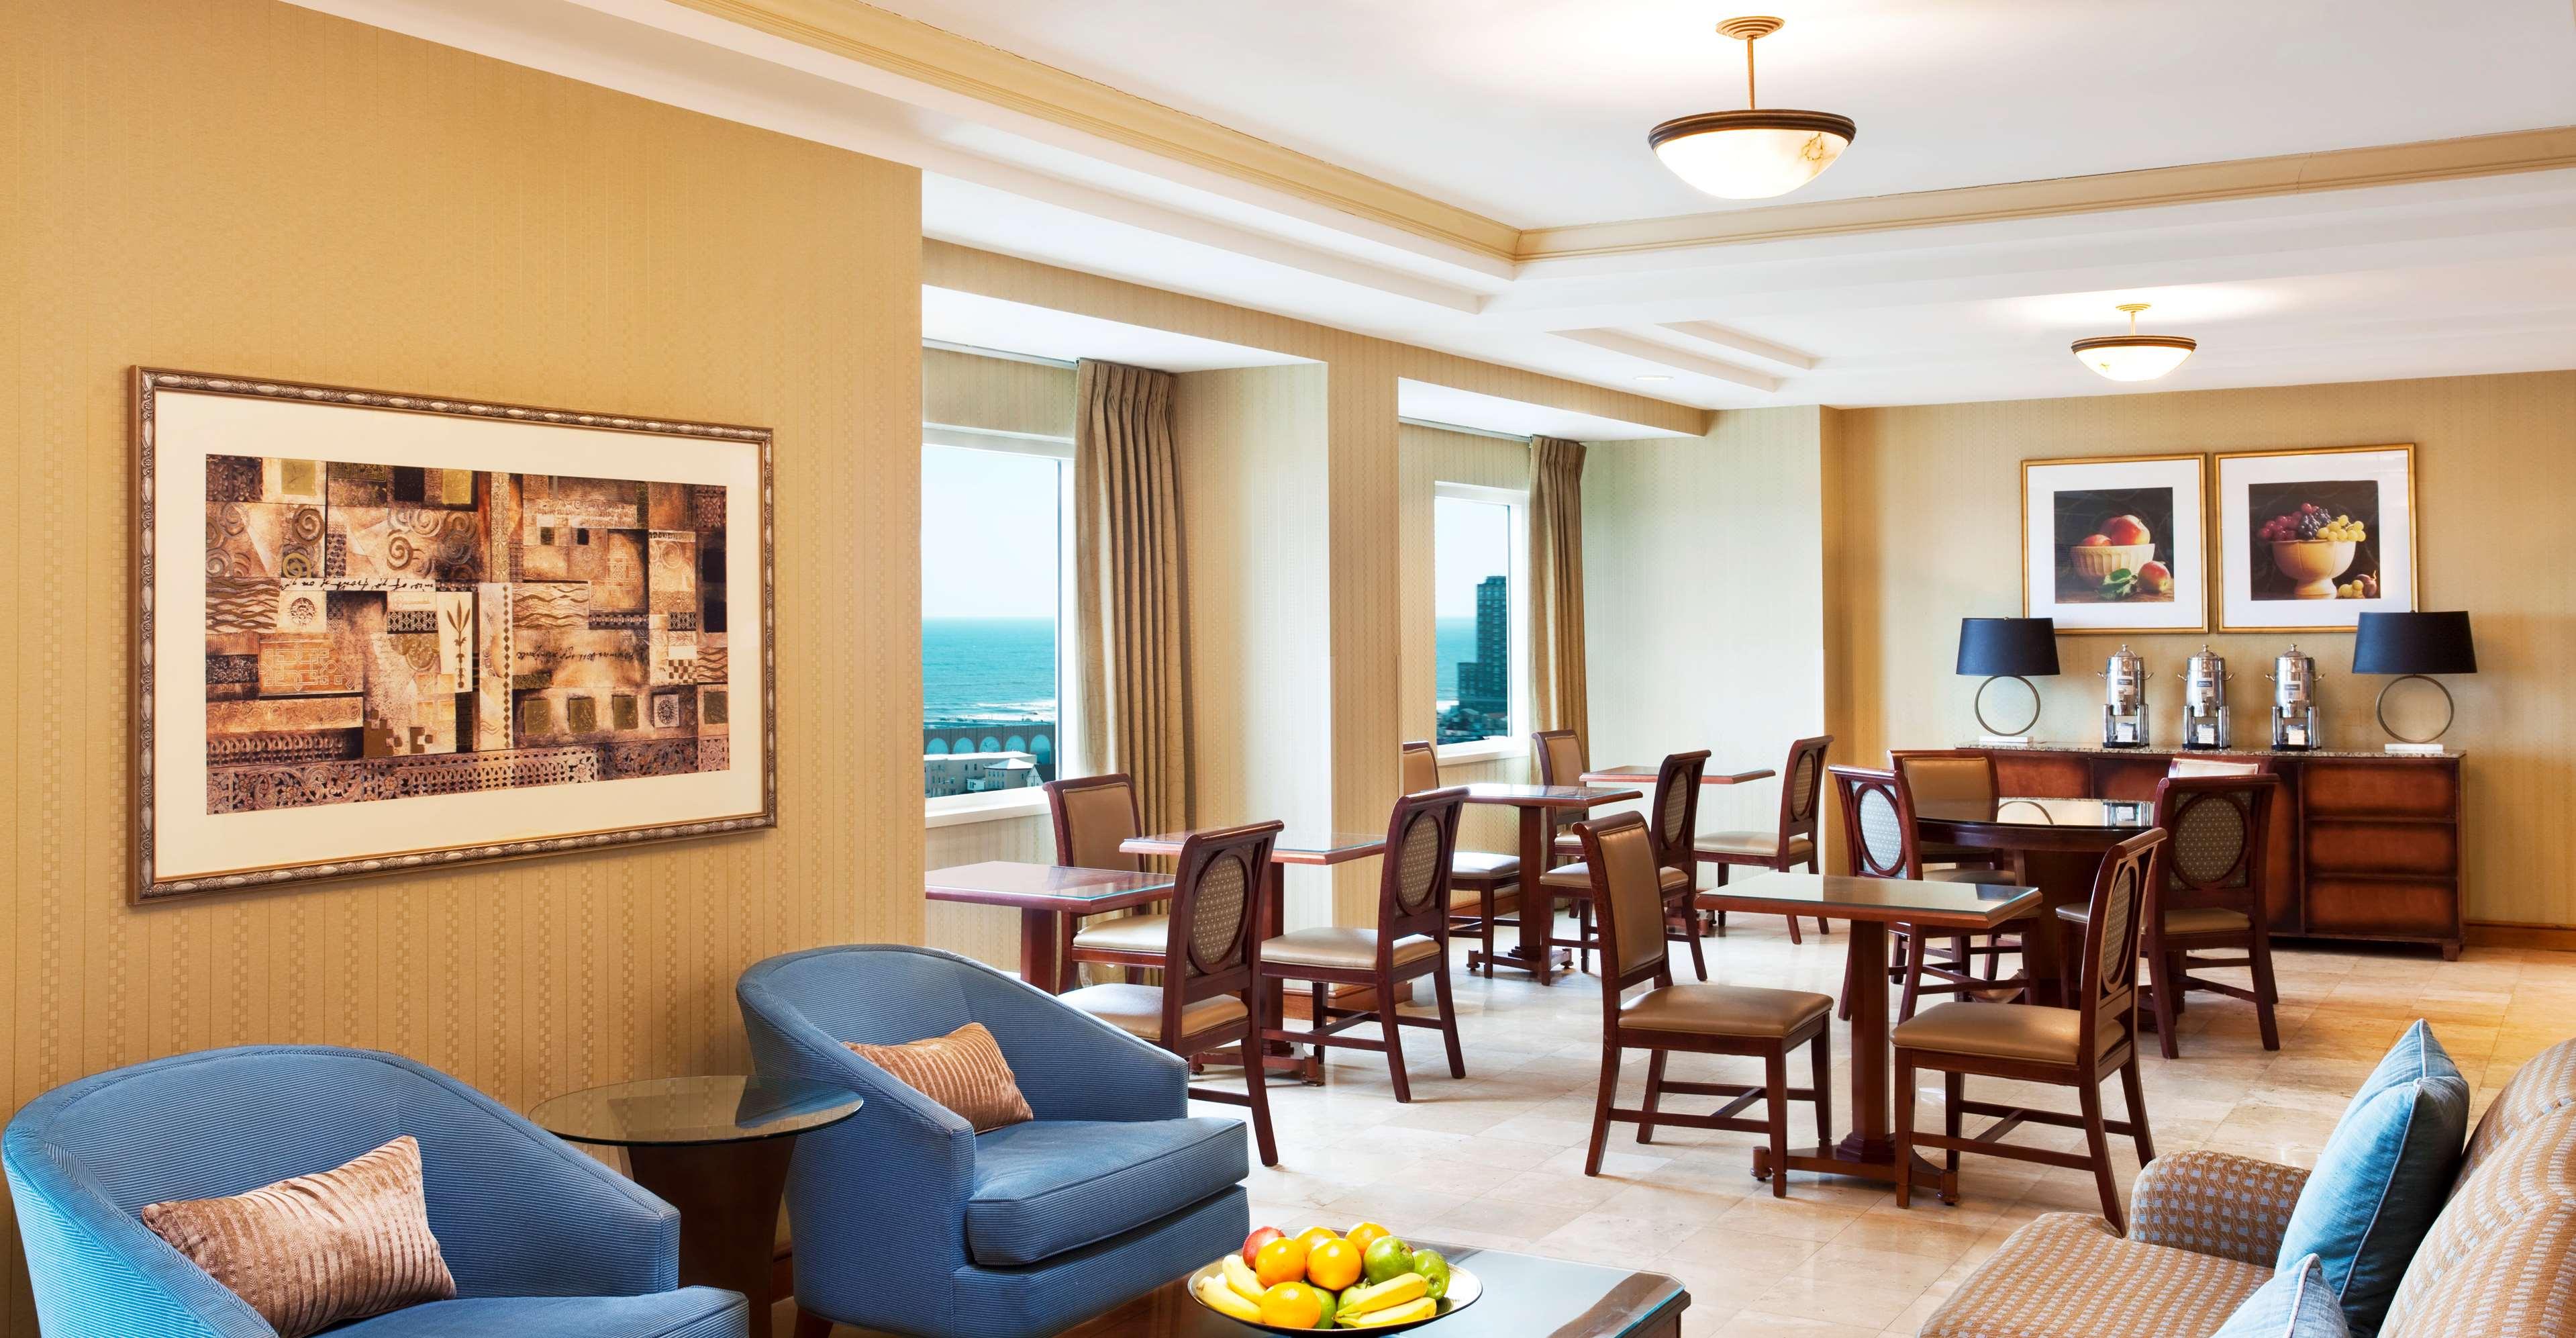 Sheraton Atlantic City Convention Center Hotel image 2